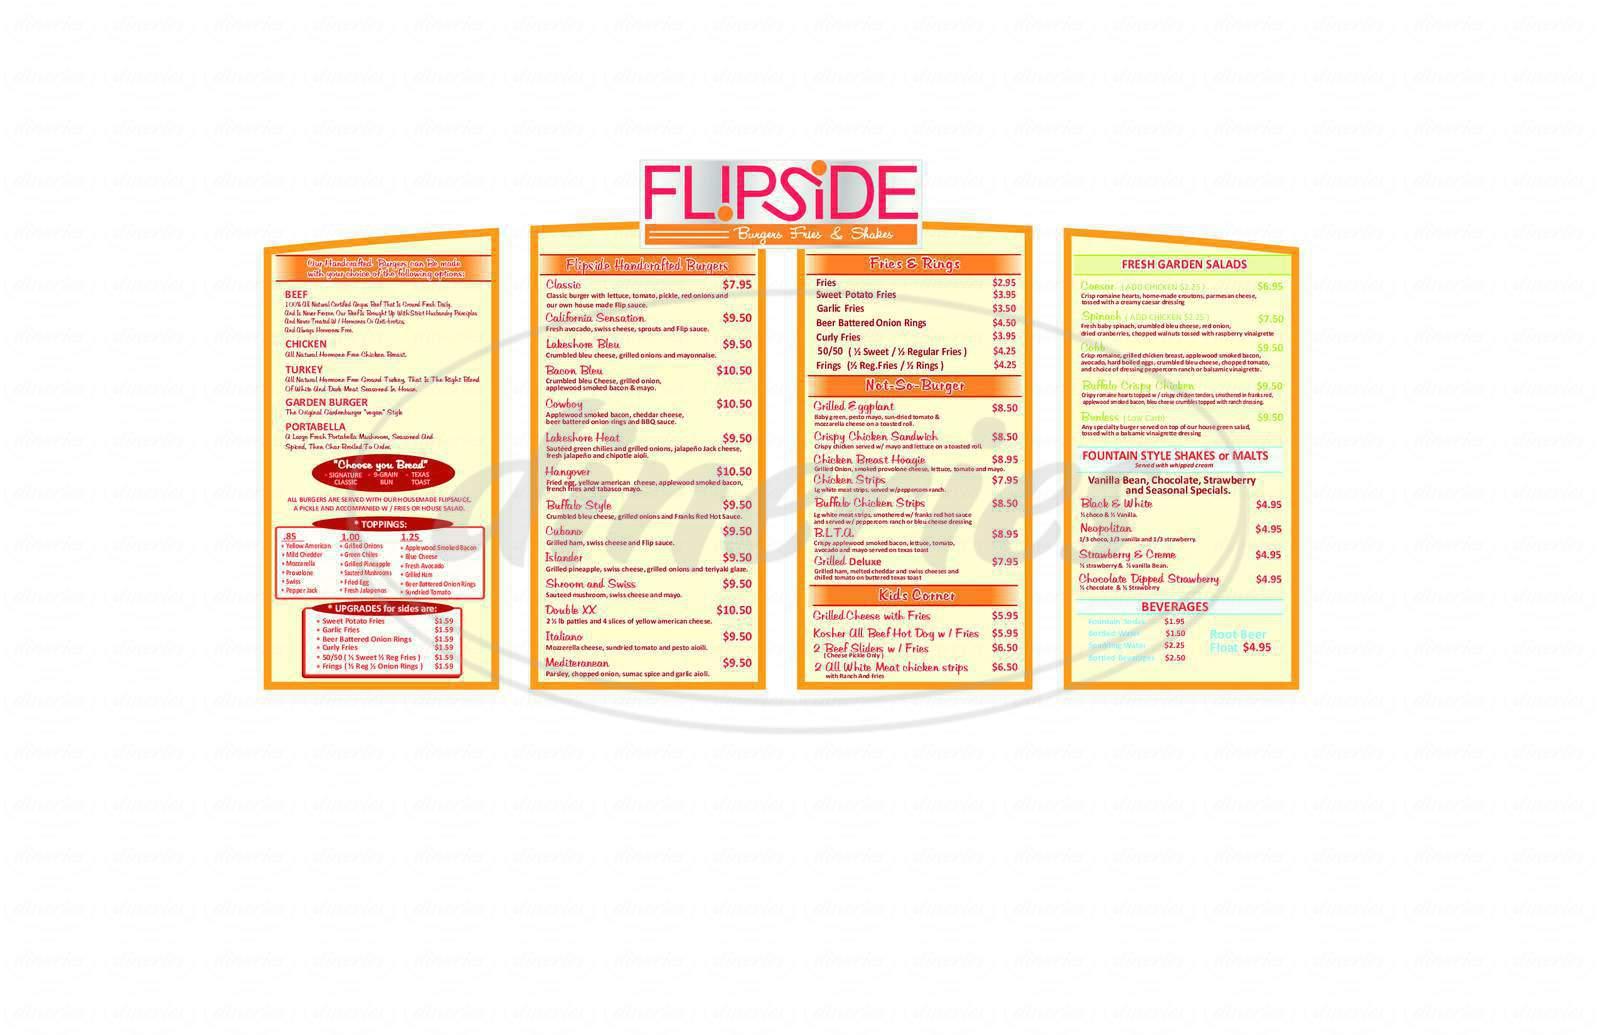 menu for Flipside